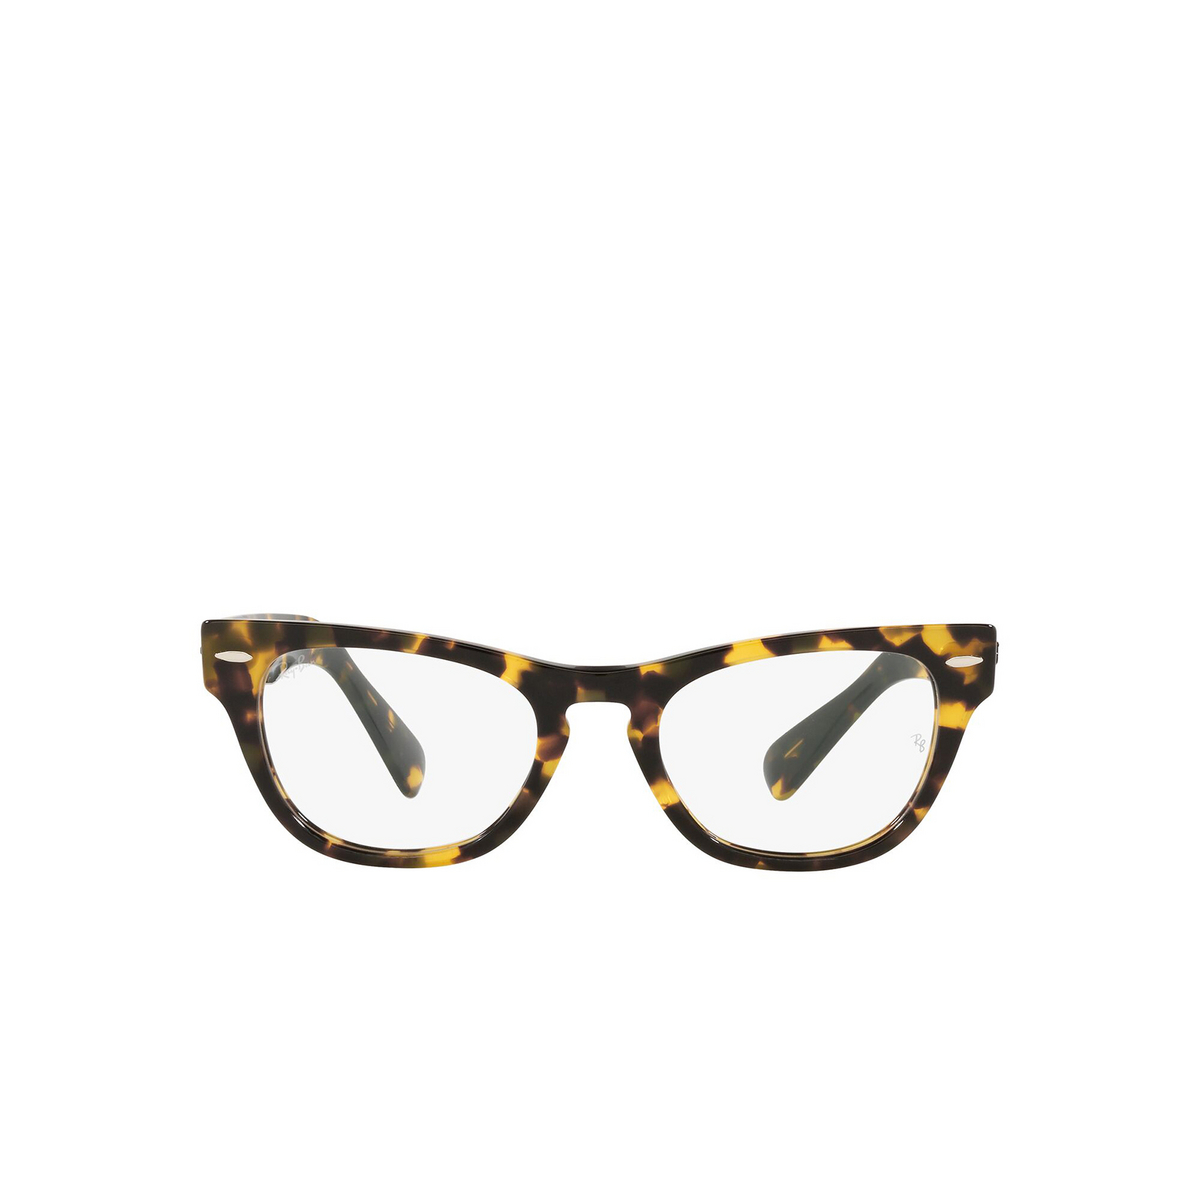 Ray-Ban® Cat-eye Eyeglasses: Laramie RX2201V color Yellow Havana 8116 - front view.